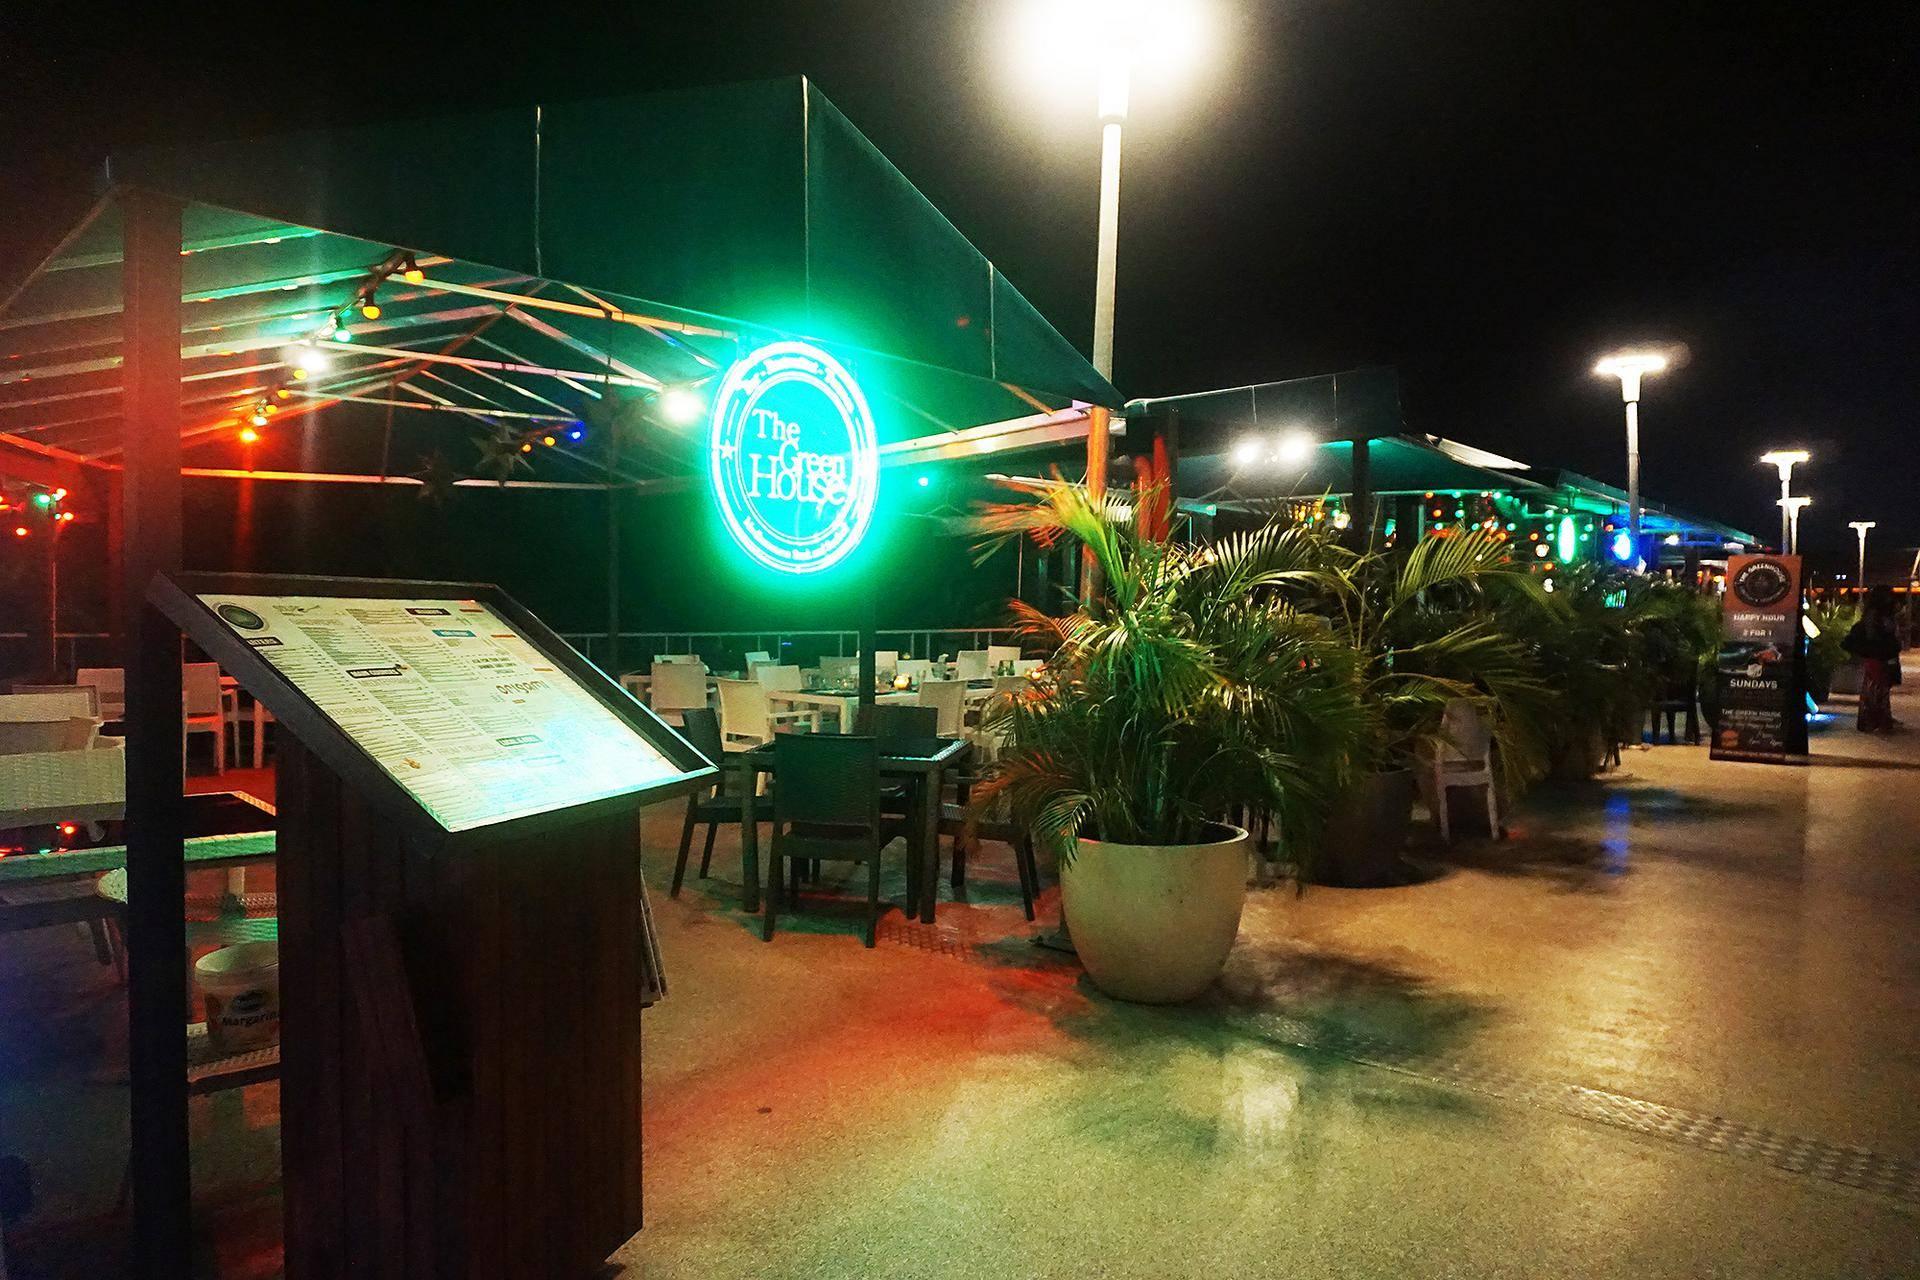 The Green House, em Mambo Beach